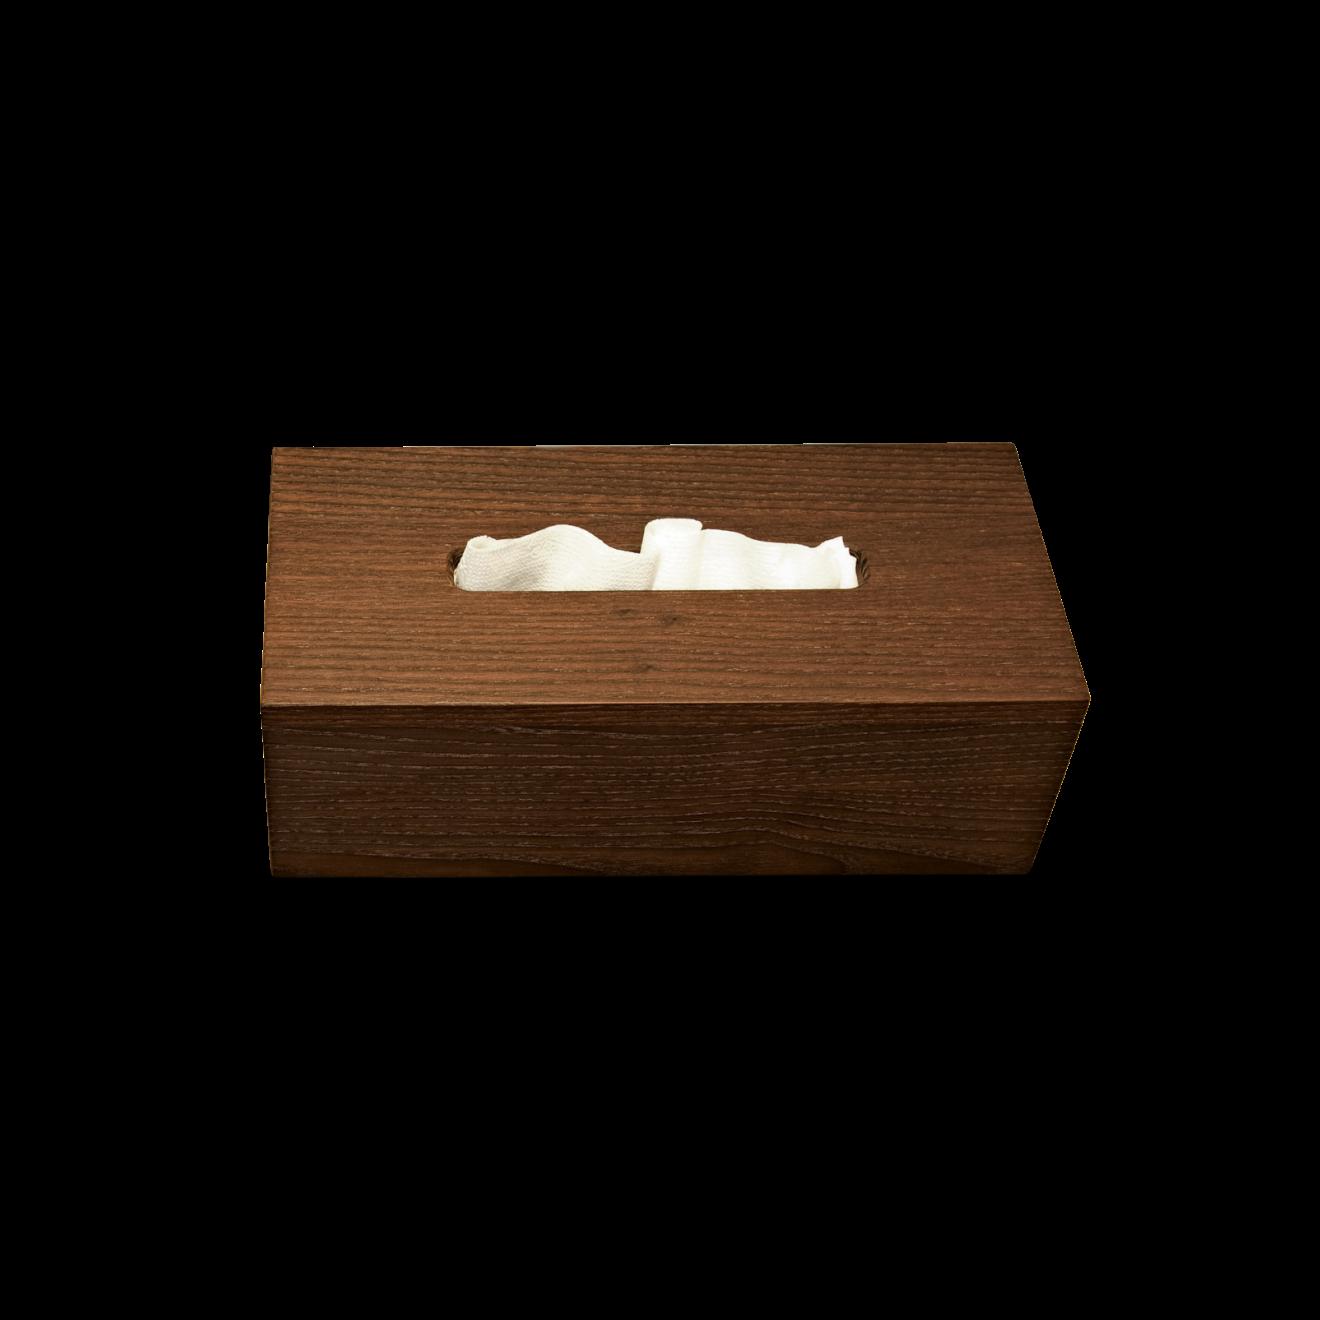 decor walther kleenexbox aus holz duschvorhangstangen. Black Bedroom Furniture Sets. Home Design Ideas